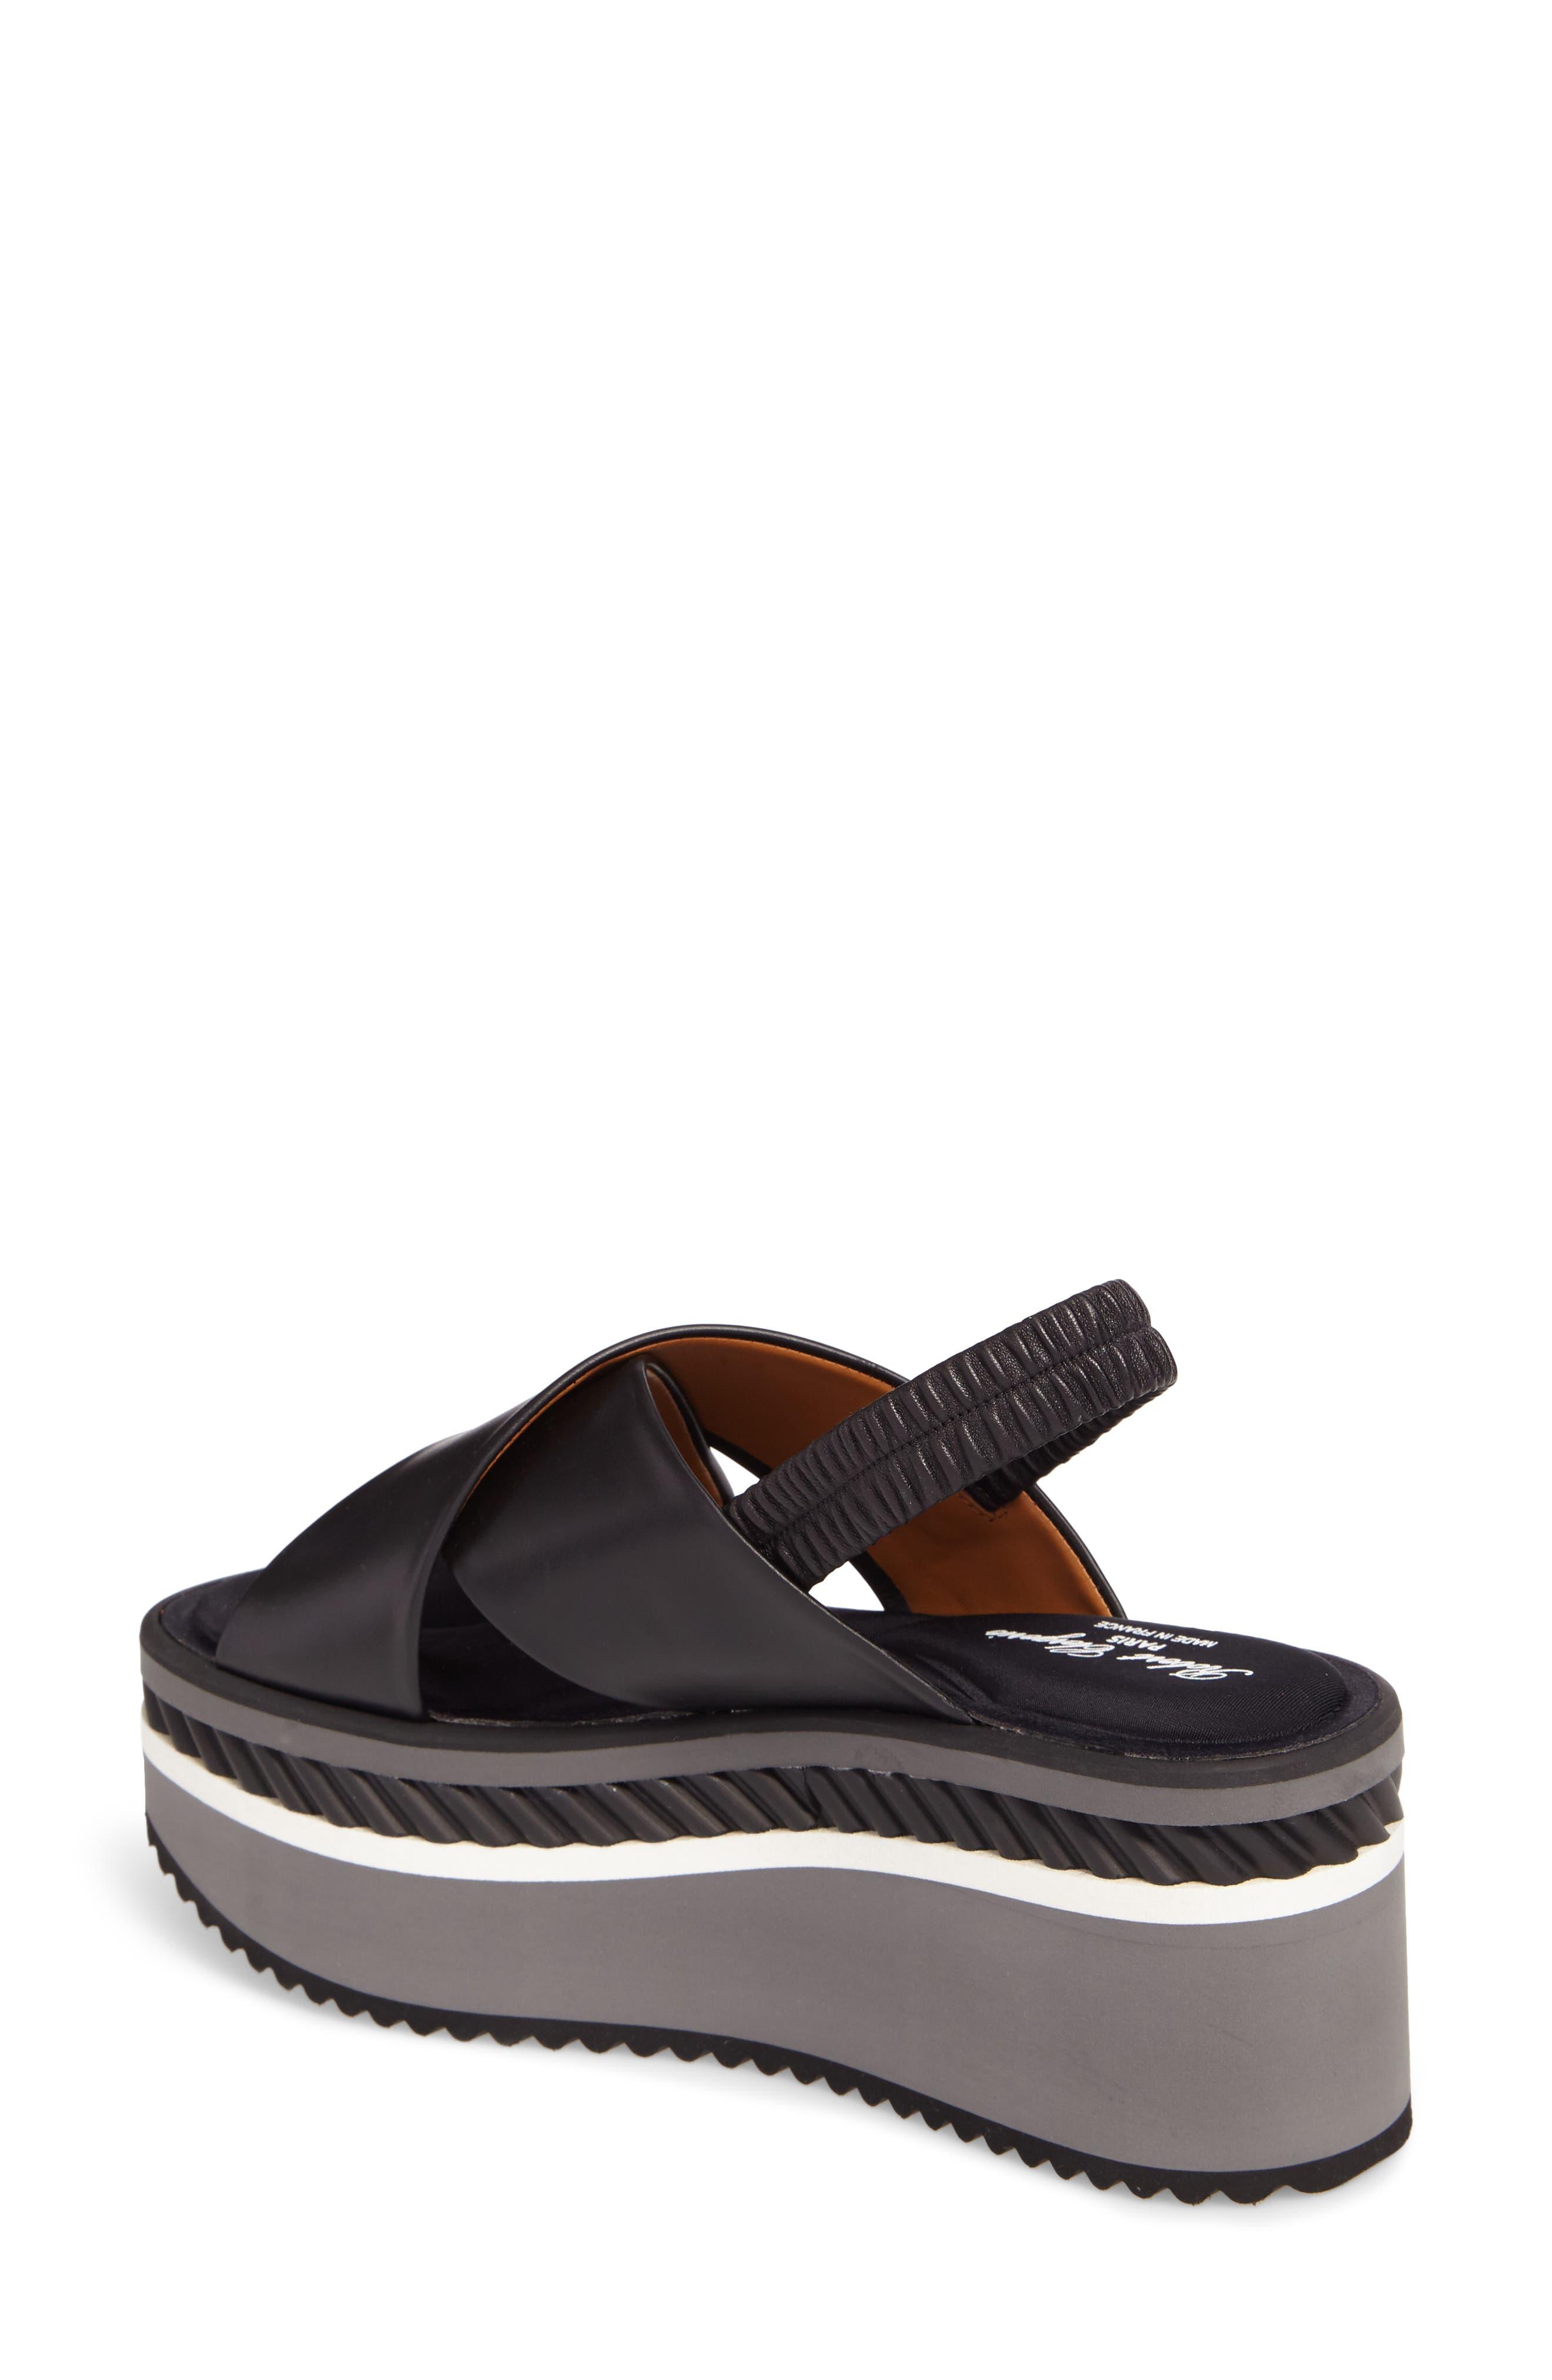 Omin Platform Slingback Sandal,                             Alternate thumbnail 2, color,                             001